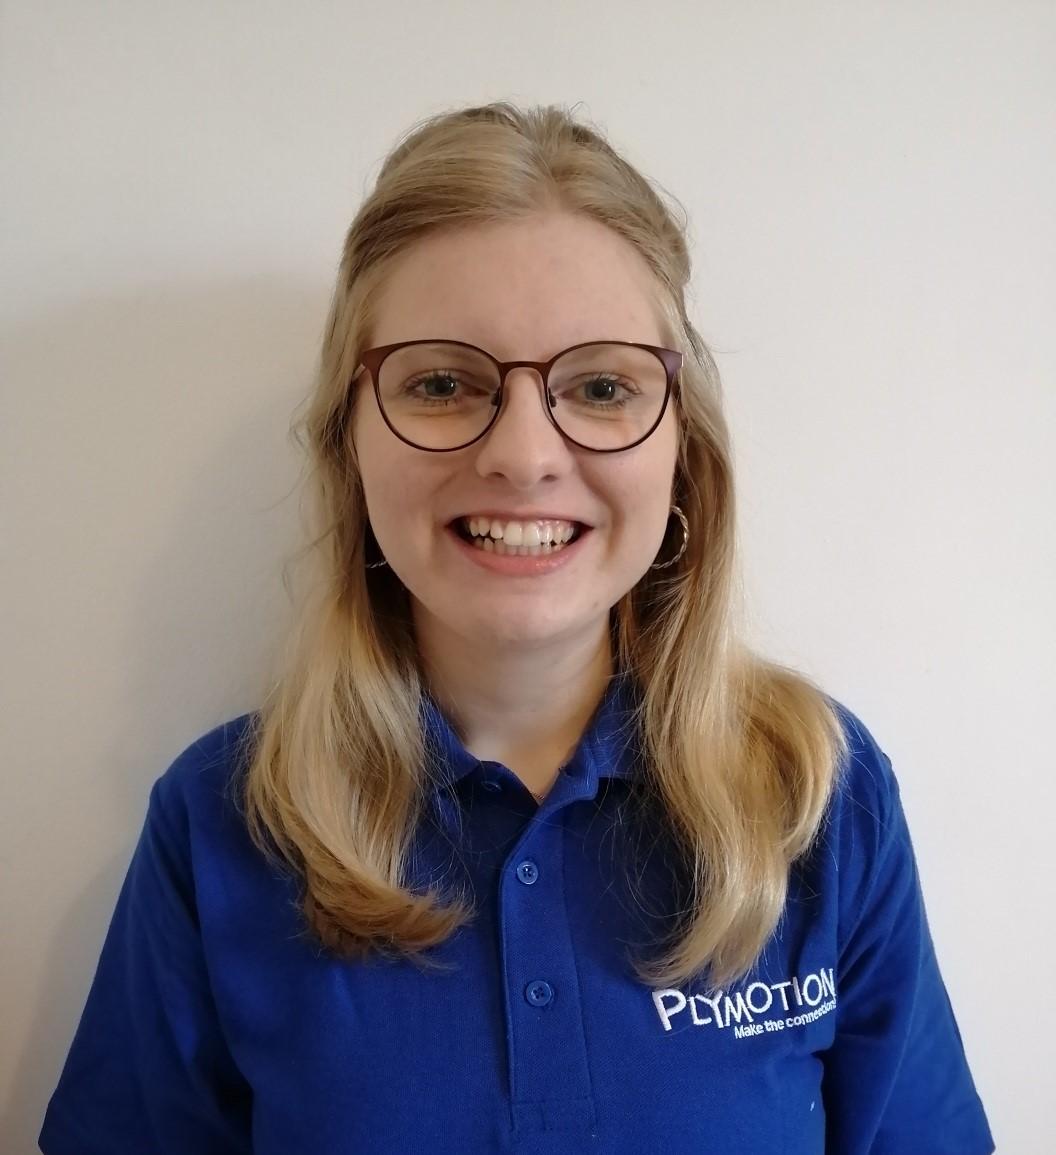 Picture of Plymotion Travel Advisor Supervisor